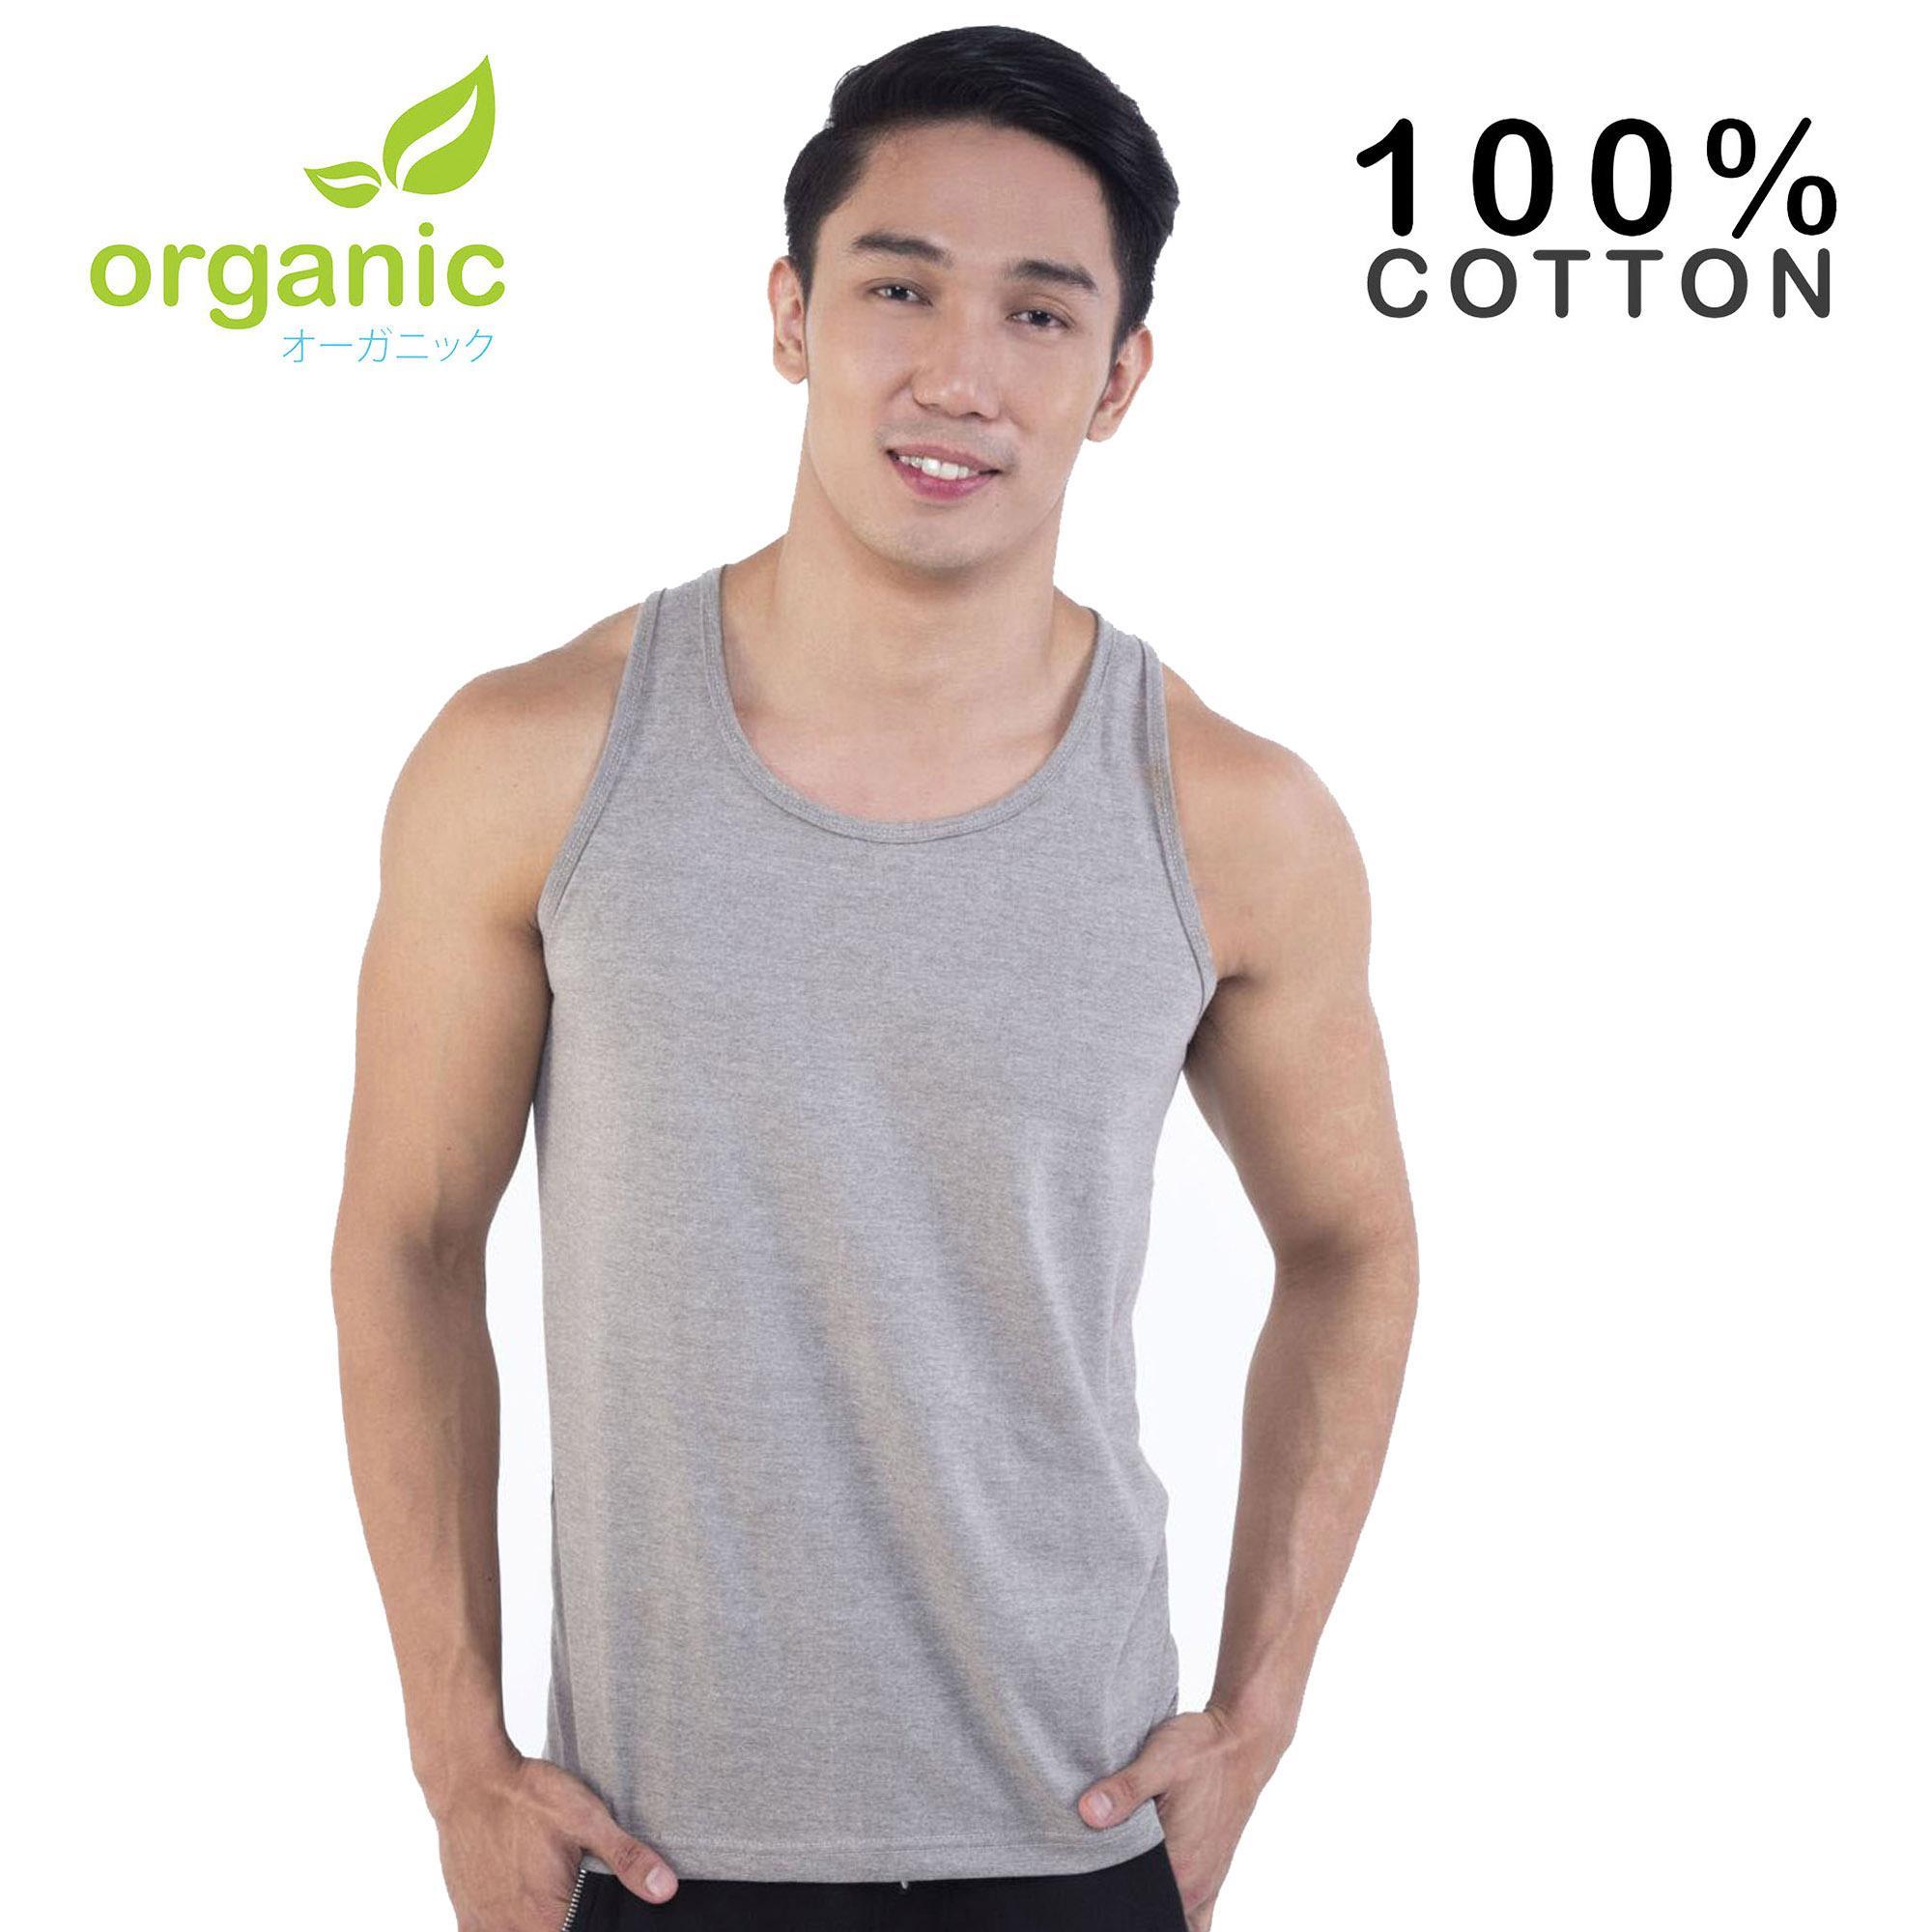 54b64971cef31 Camisole for Men for sale - Tank Tops for Men online brands